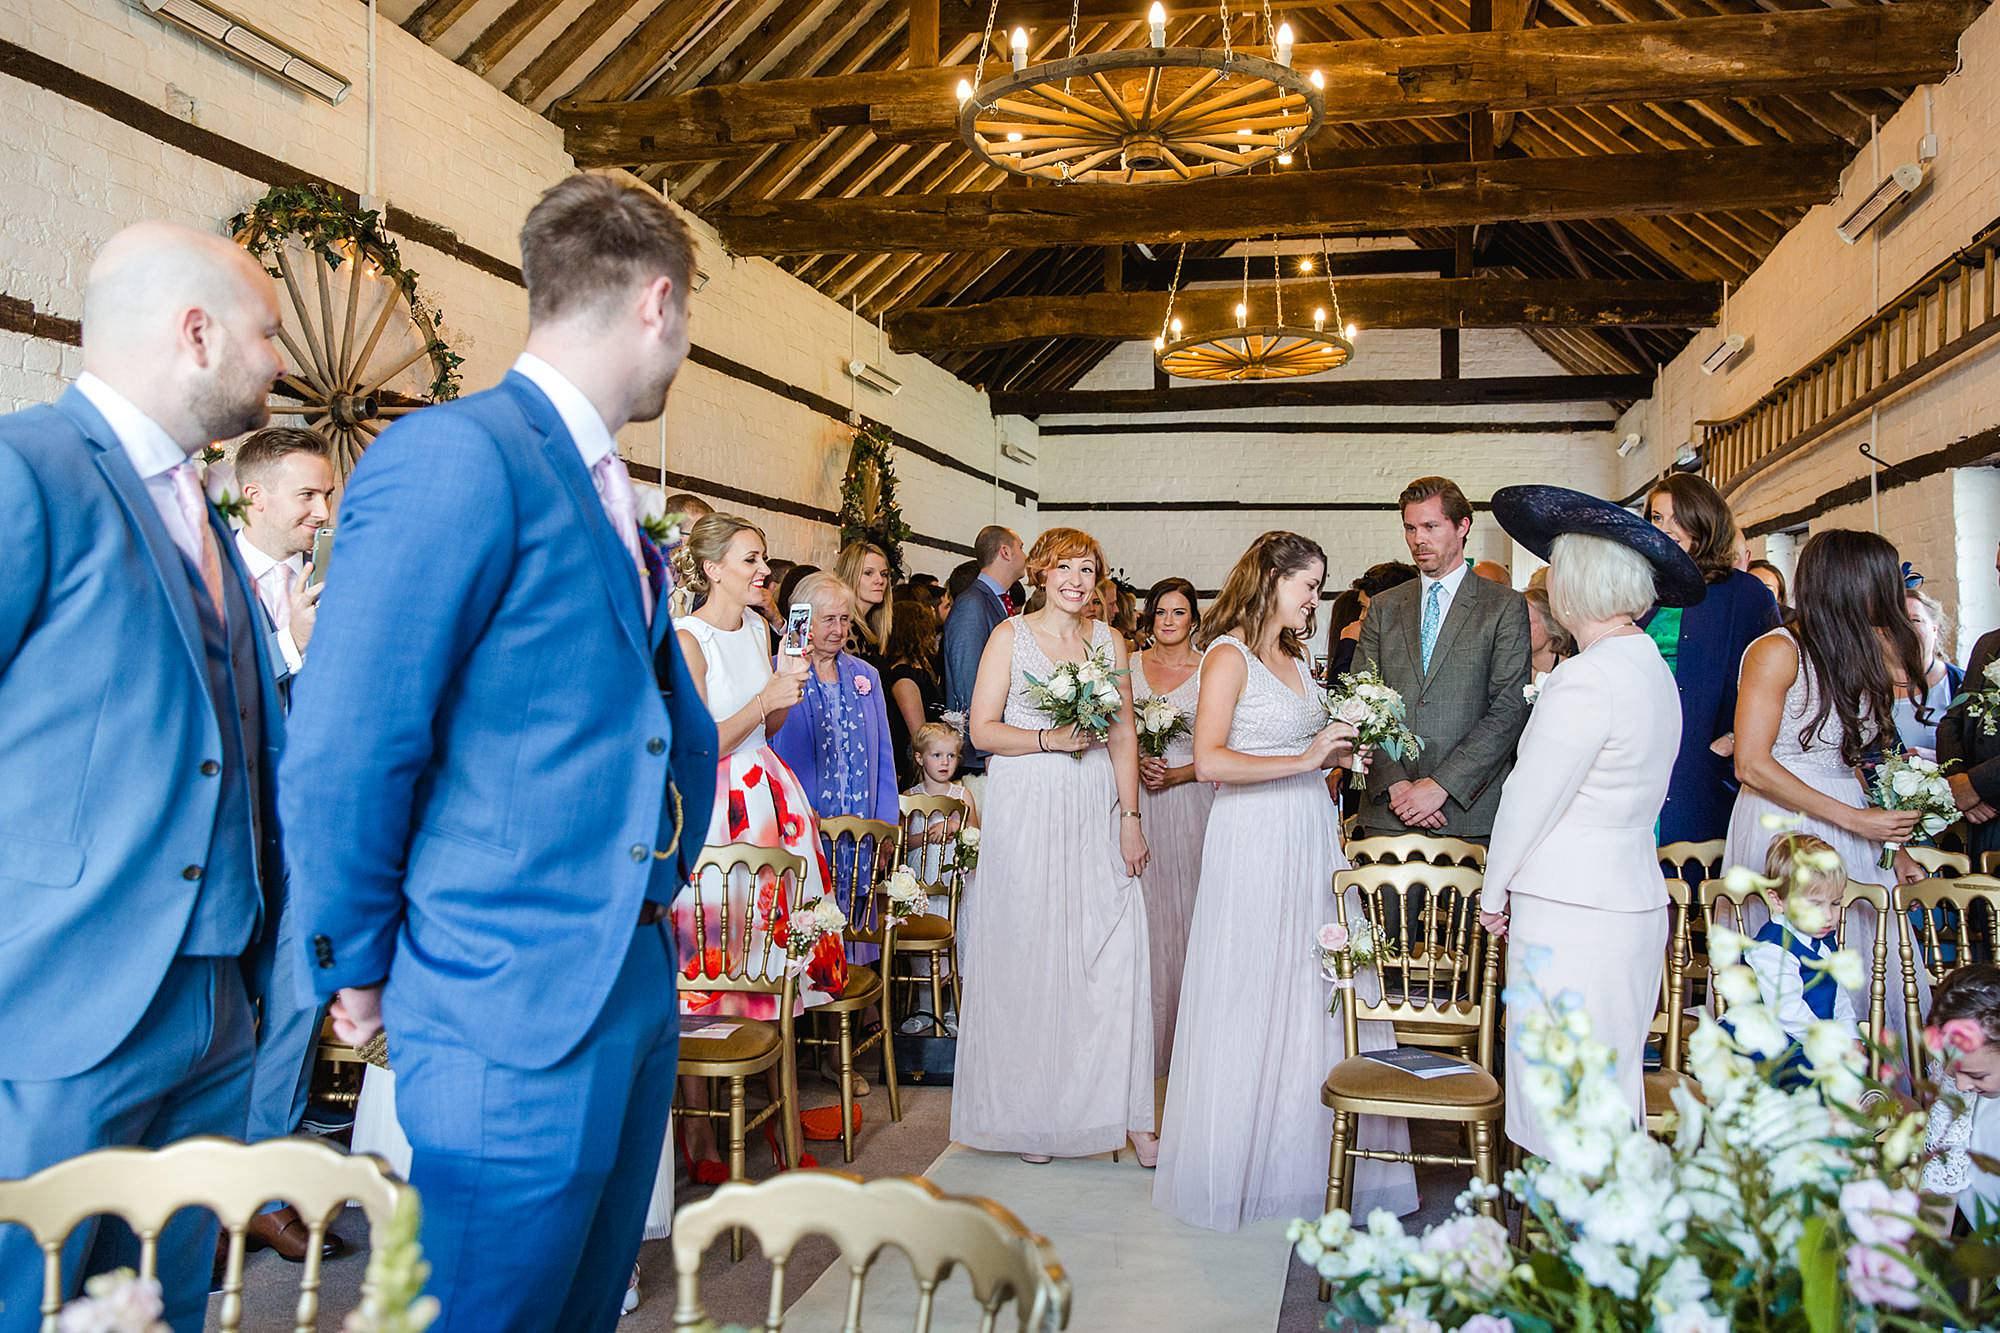 Lillibrooke Manor wedding bridesmaids walking down the aisle